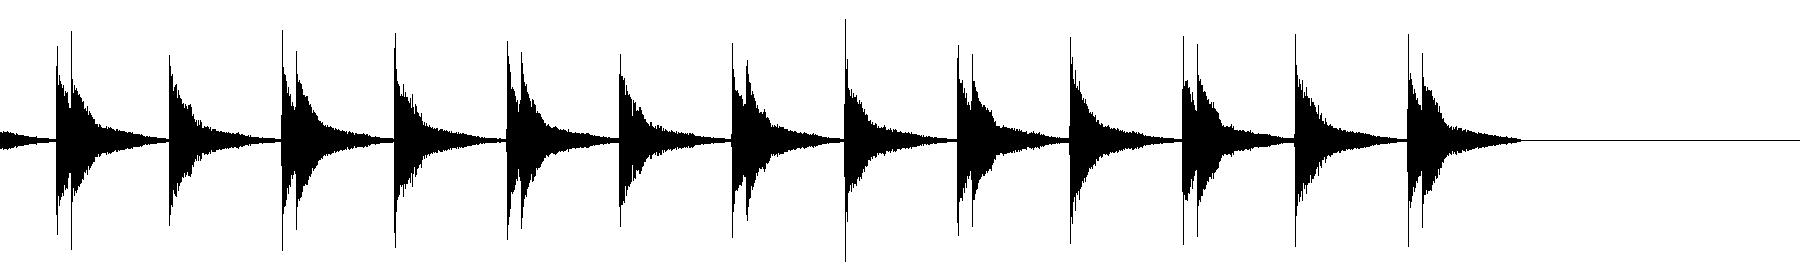 dts chordlp 41b cm wet